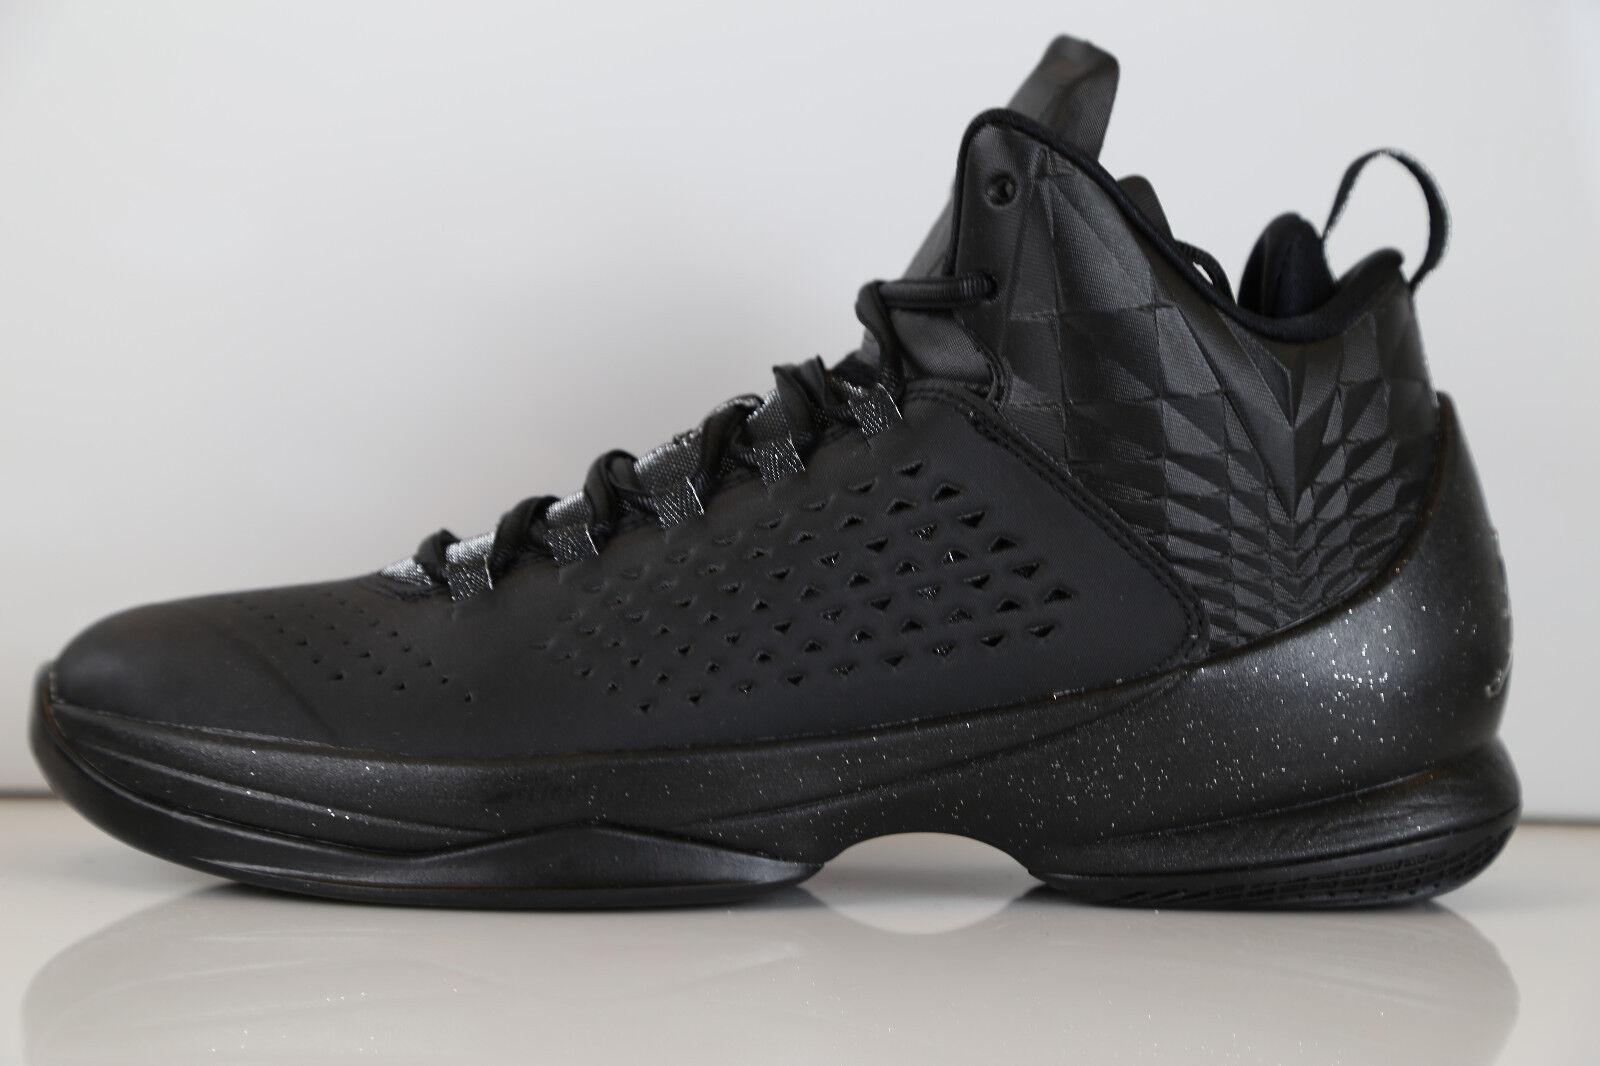 Nike Air Jordan Melo M11 Black Metallic Silver 716227-010 8-14 retro 1 11 3 4 7